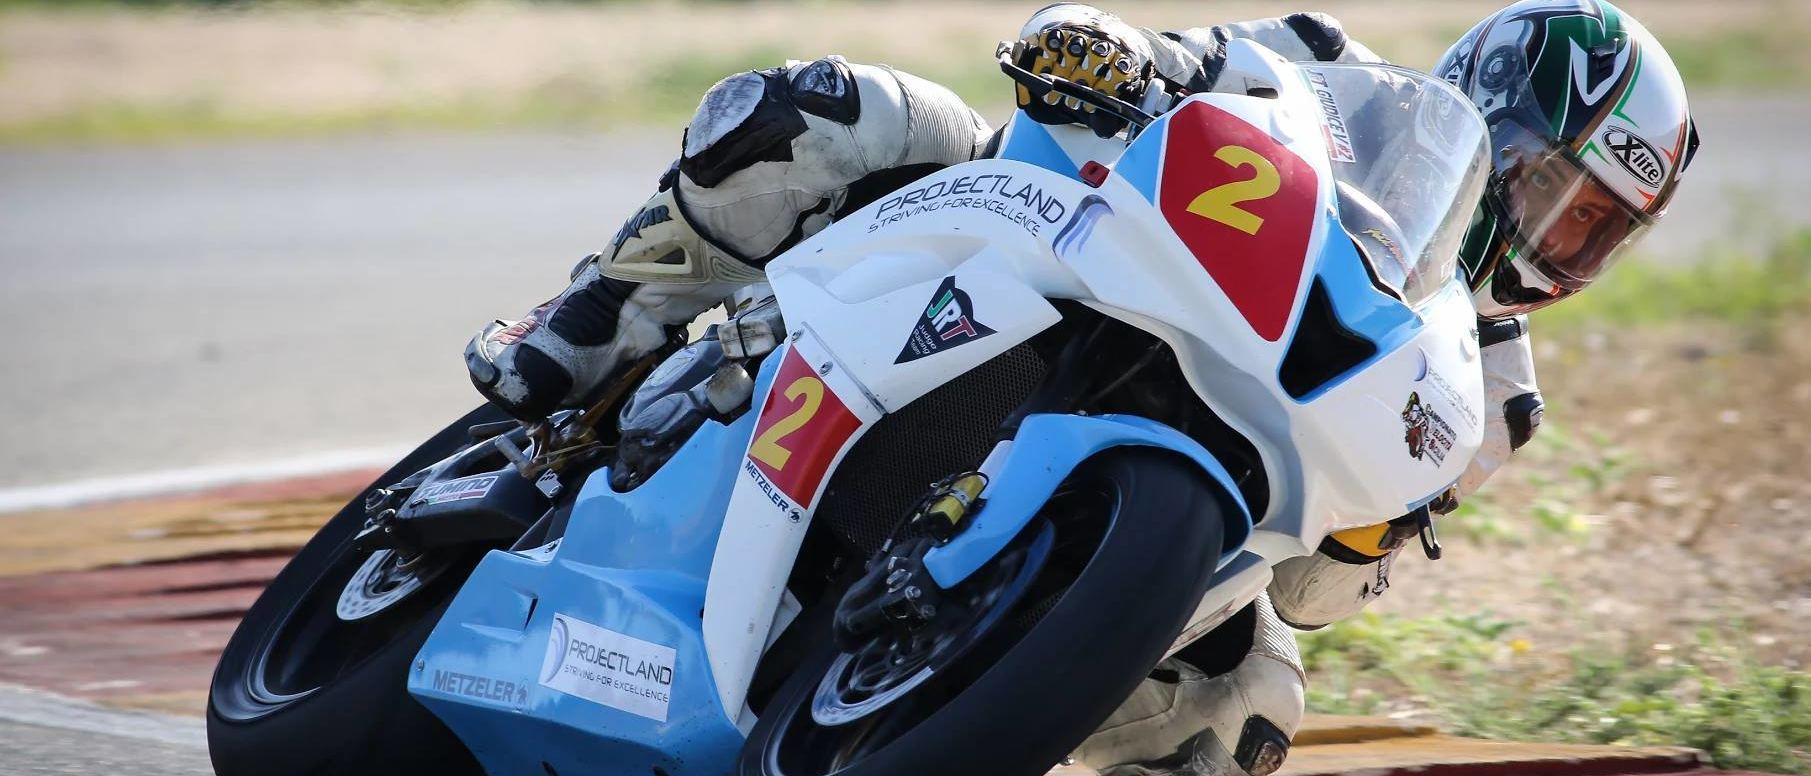 Projectland Sponsor Moto